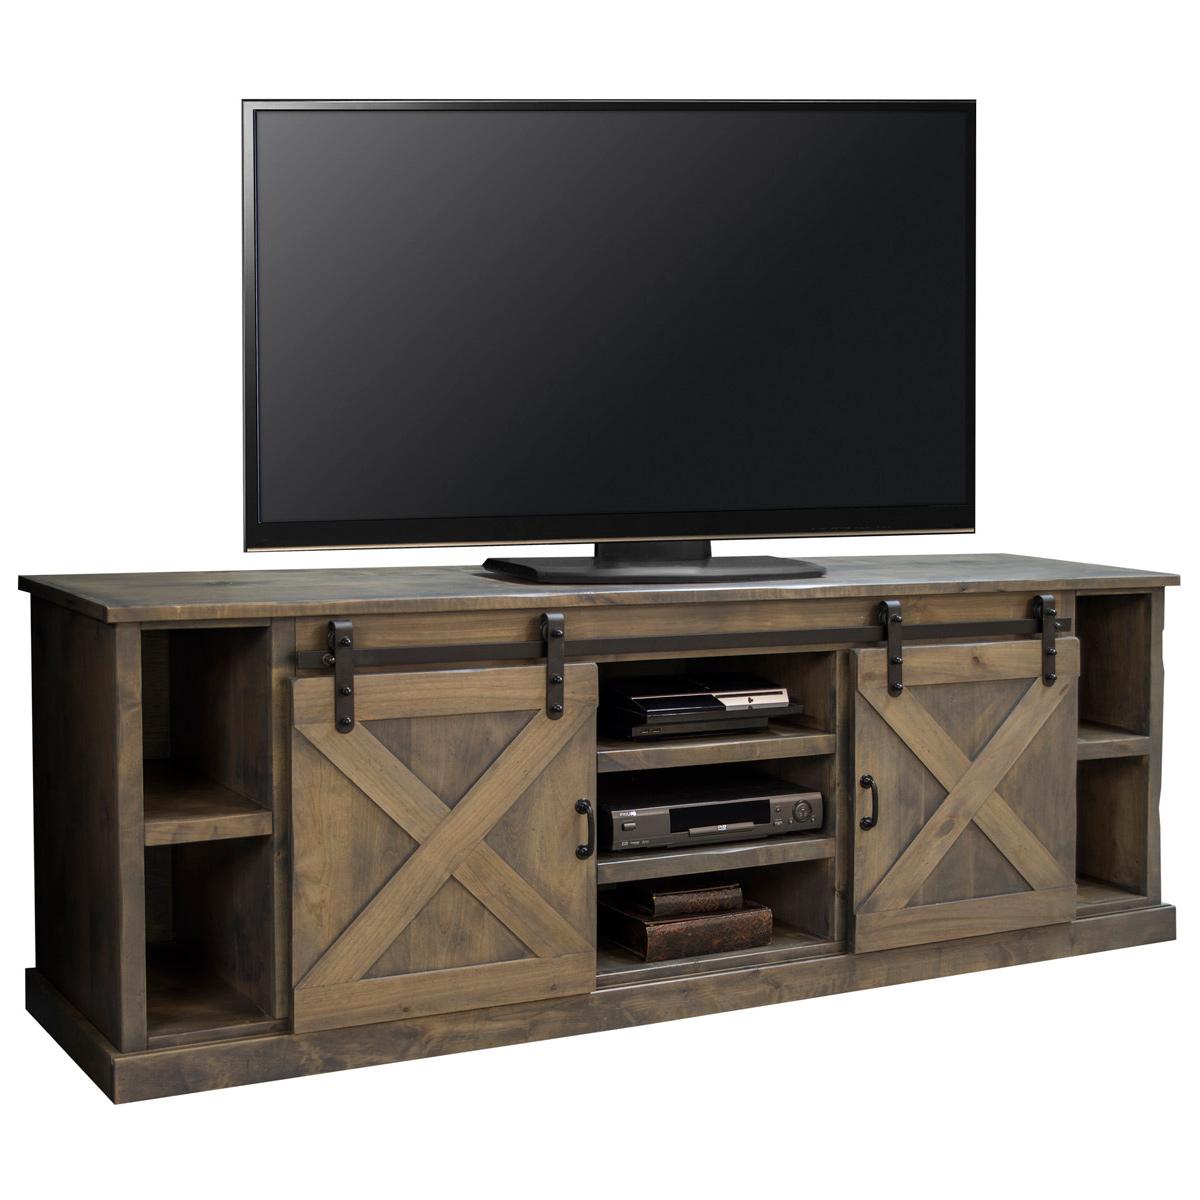 Legends Furniture FH1425 Farmhouse 85 TV Stand Console In